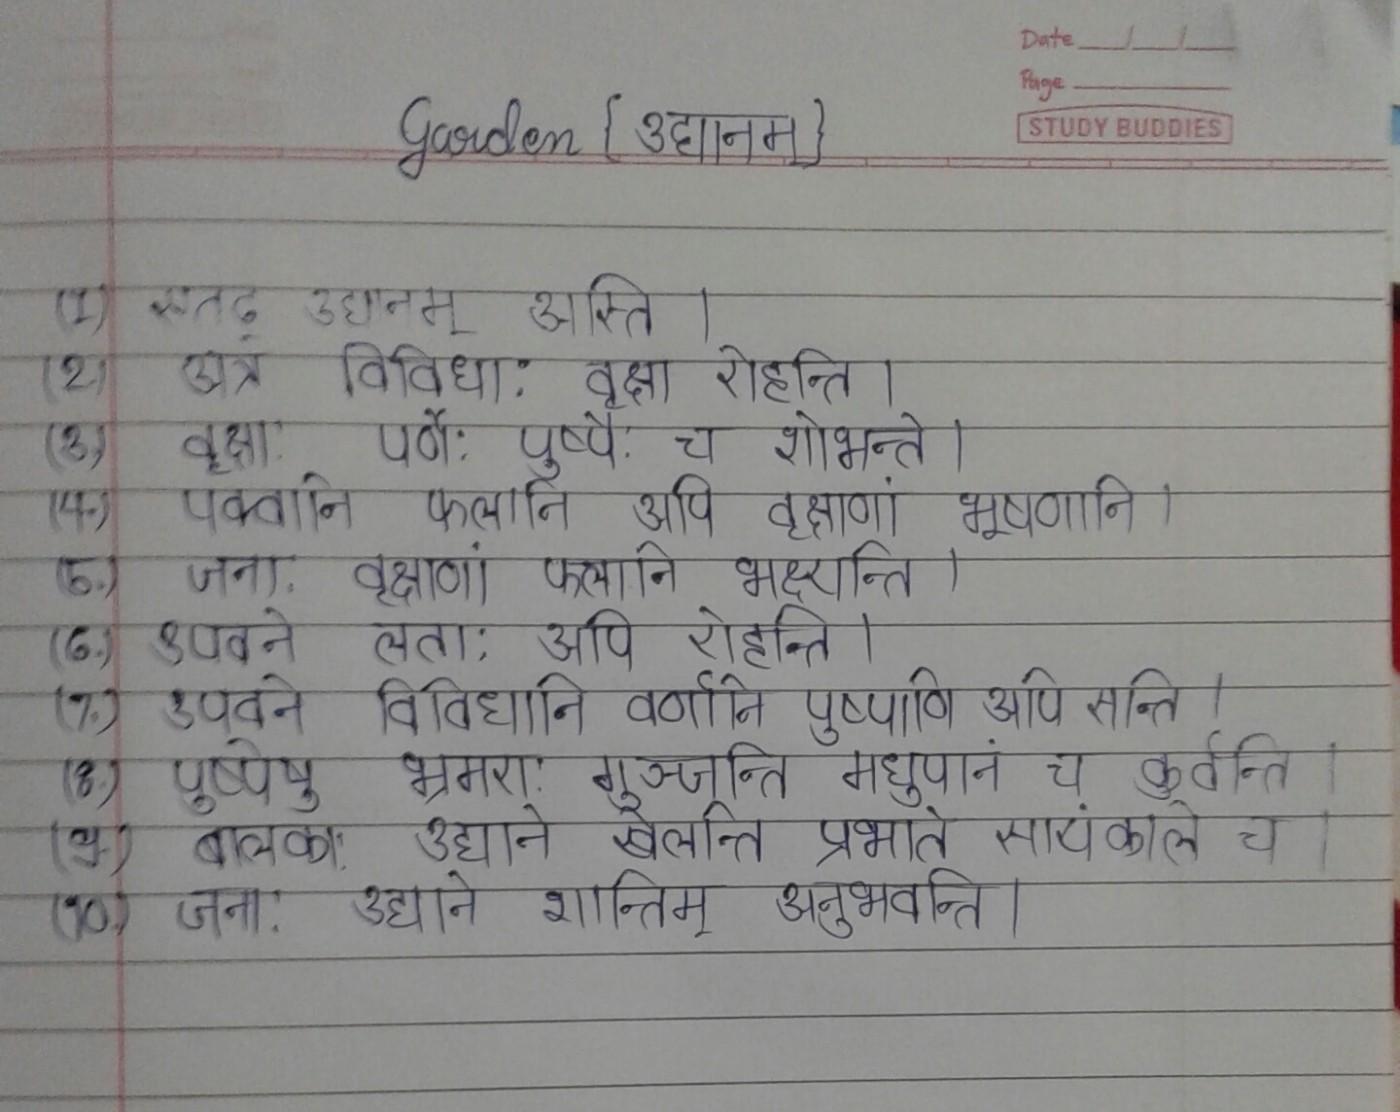 010 Our School Garden Essay Bamboodownunder Com On Gardenssl1